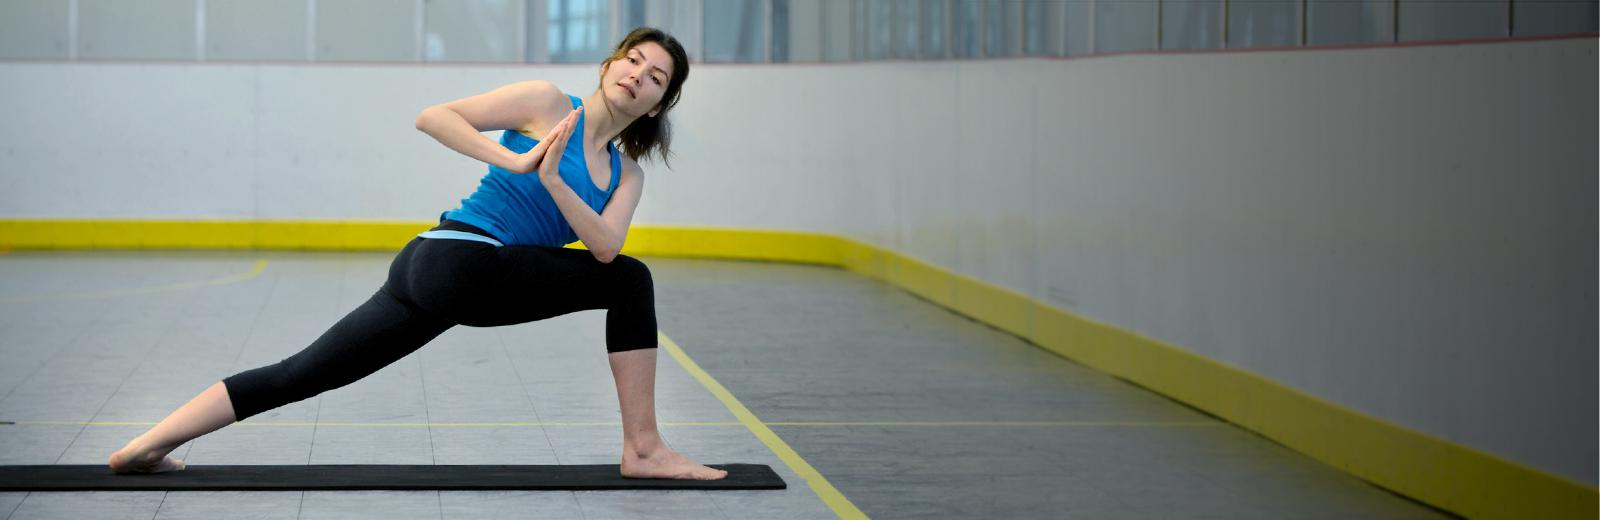 https://medical.mit.edu/sites/default/files/yoga1.jpg